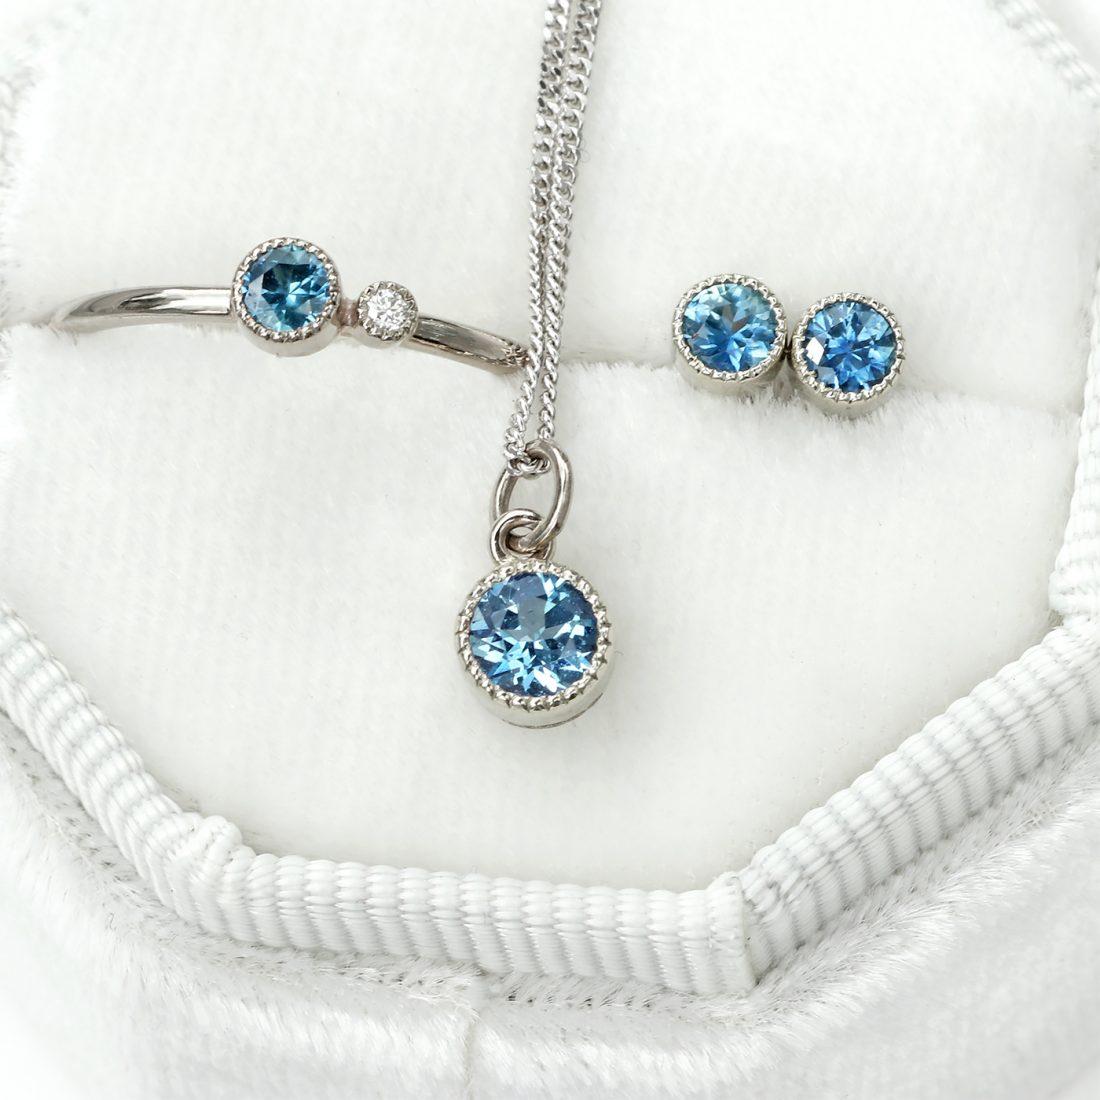 18ct White Gold Petite Milgrain Sapphire Birthstone Jewellery Set